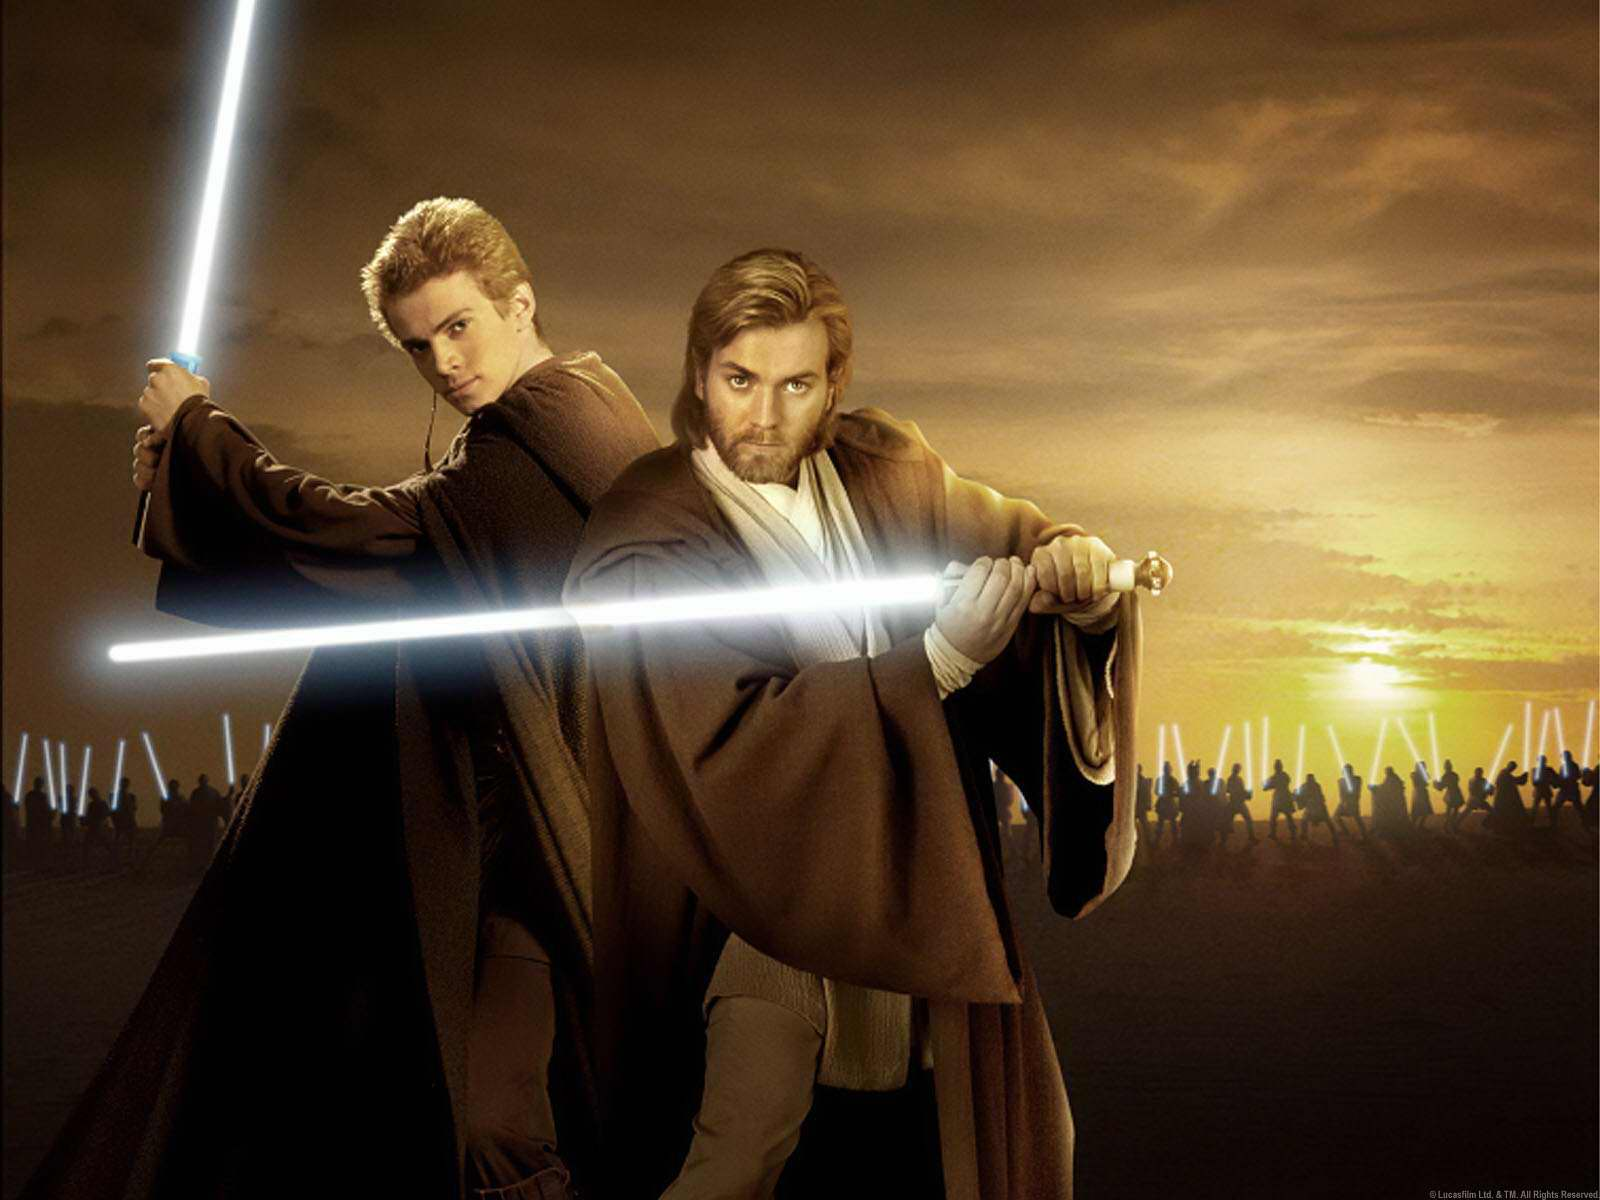 Star Wars Wallpaper Mace Windu Anakin And Obi Wan